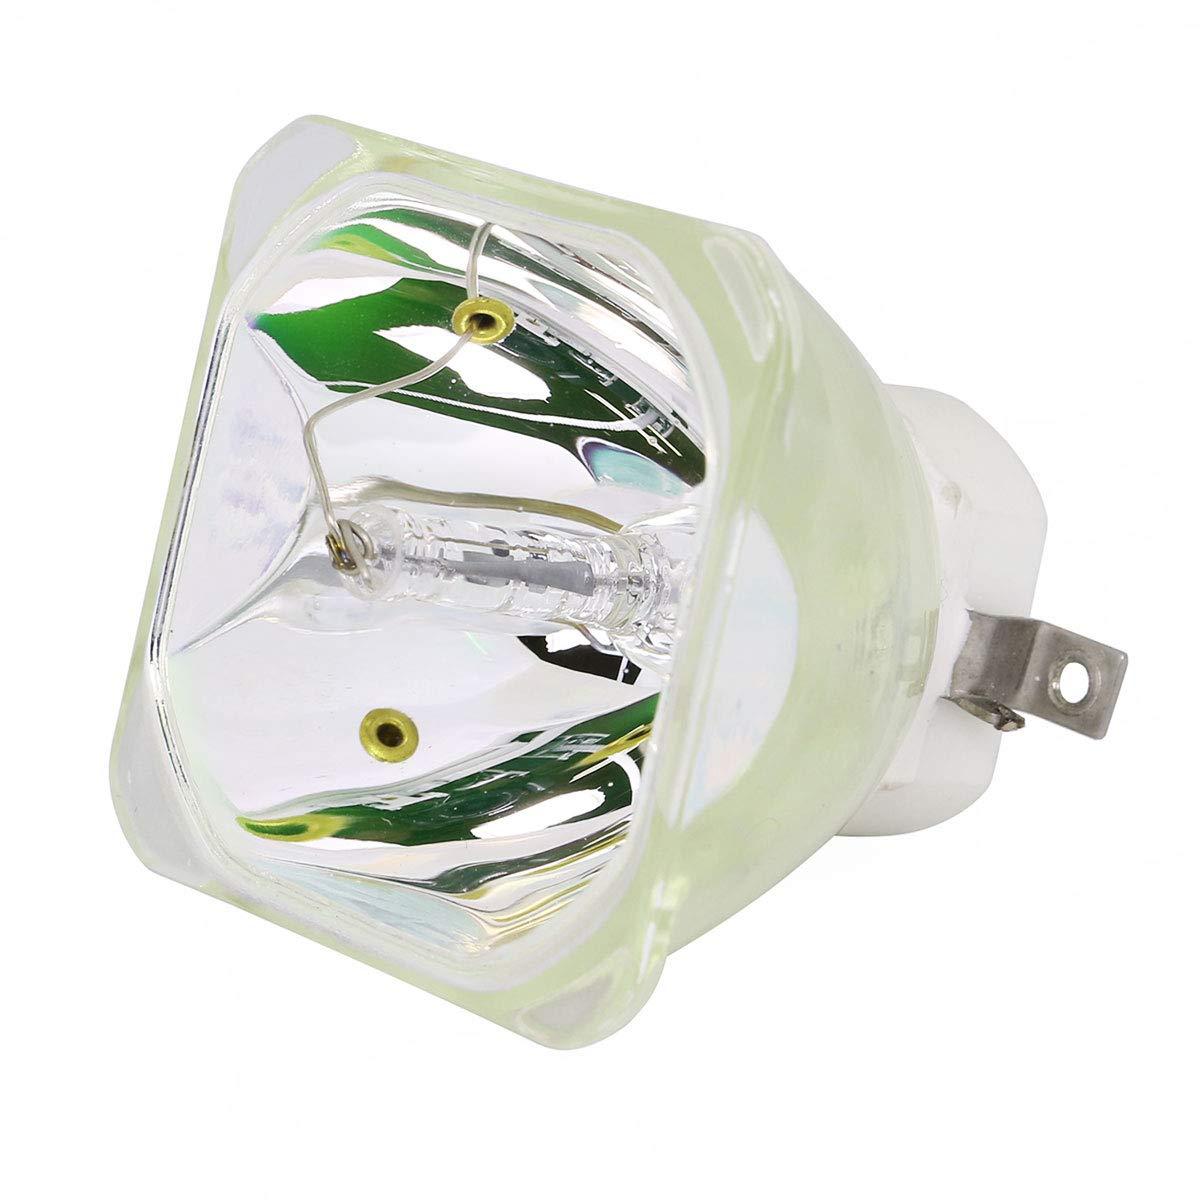 Lutema OEM 交換用ランプ ハウジング/電球付き 三菱VLT-HC7000LP用 Economy Economy Lamp Only B07KTKPB68